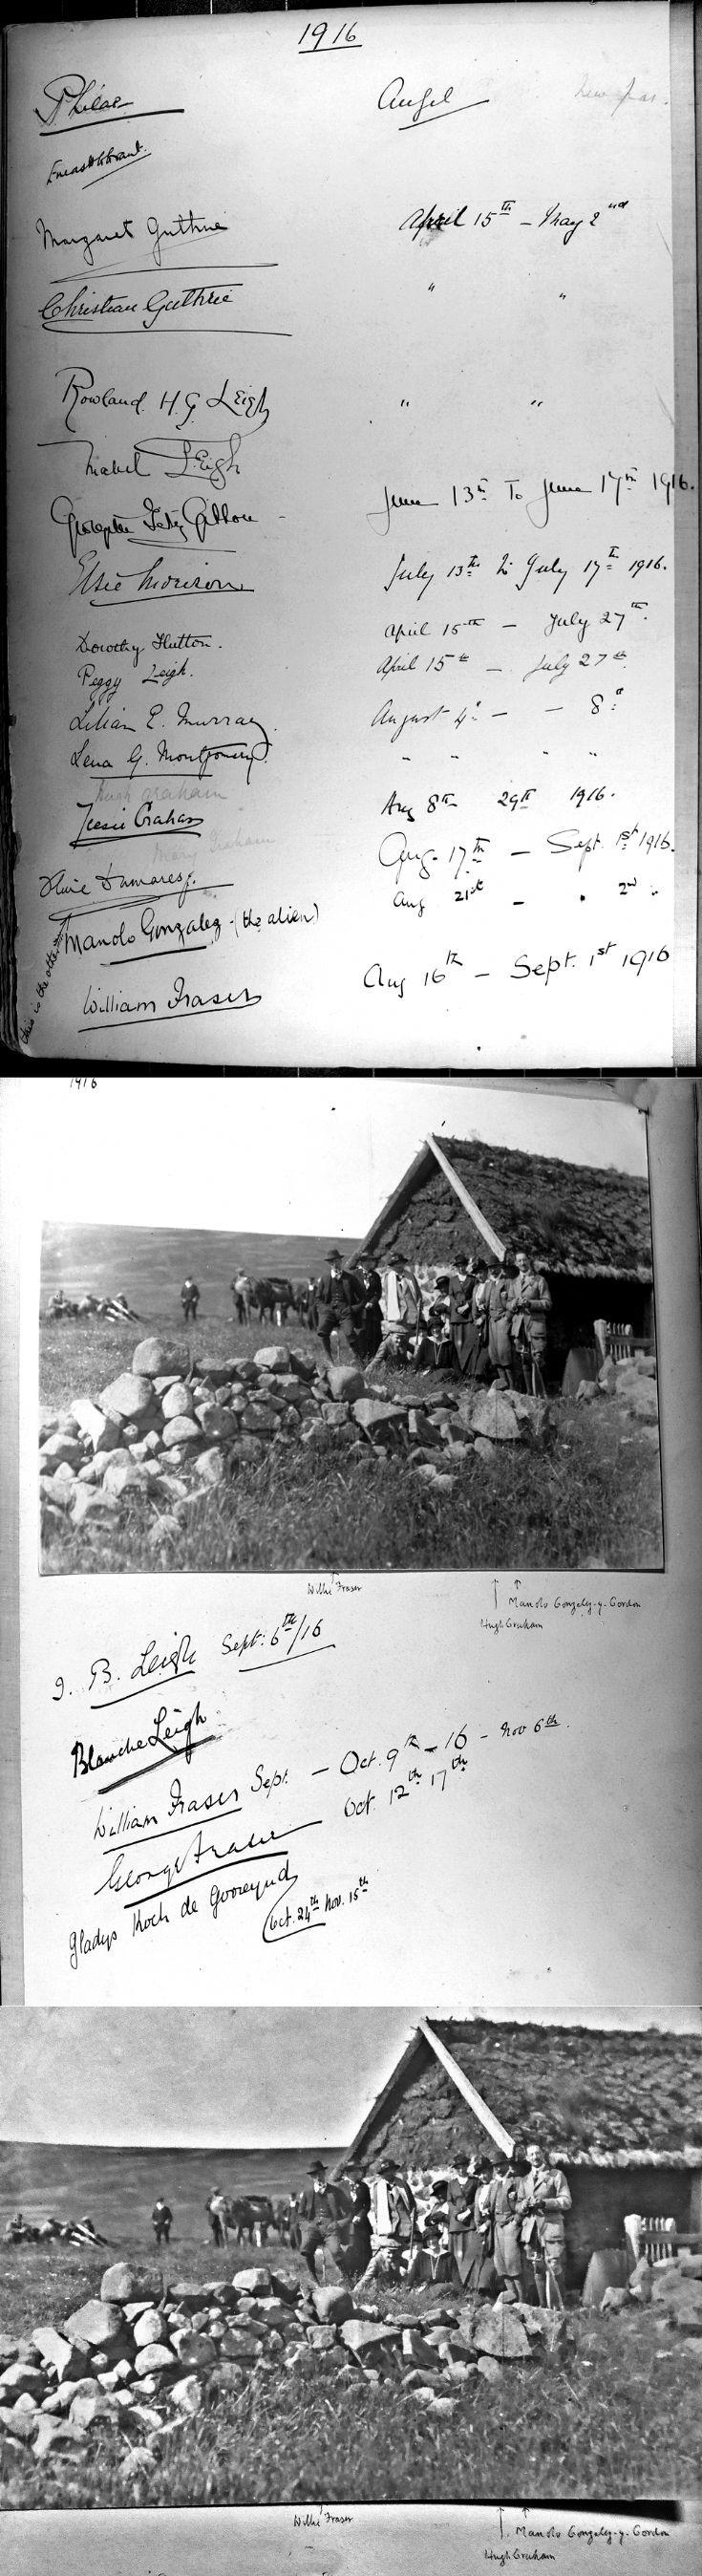 42 Castle Newe Visitors Book 1916